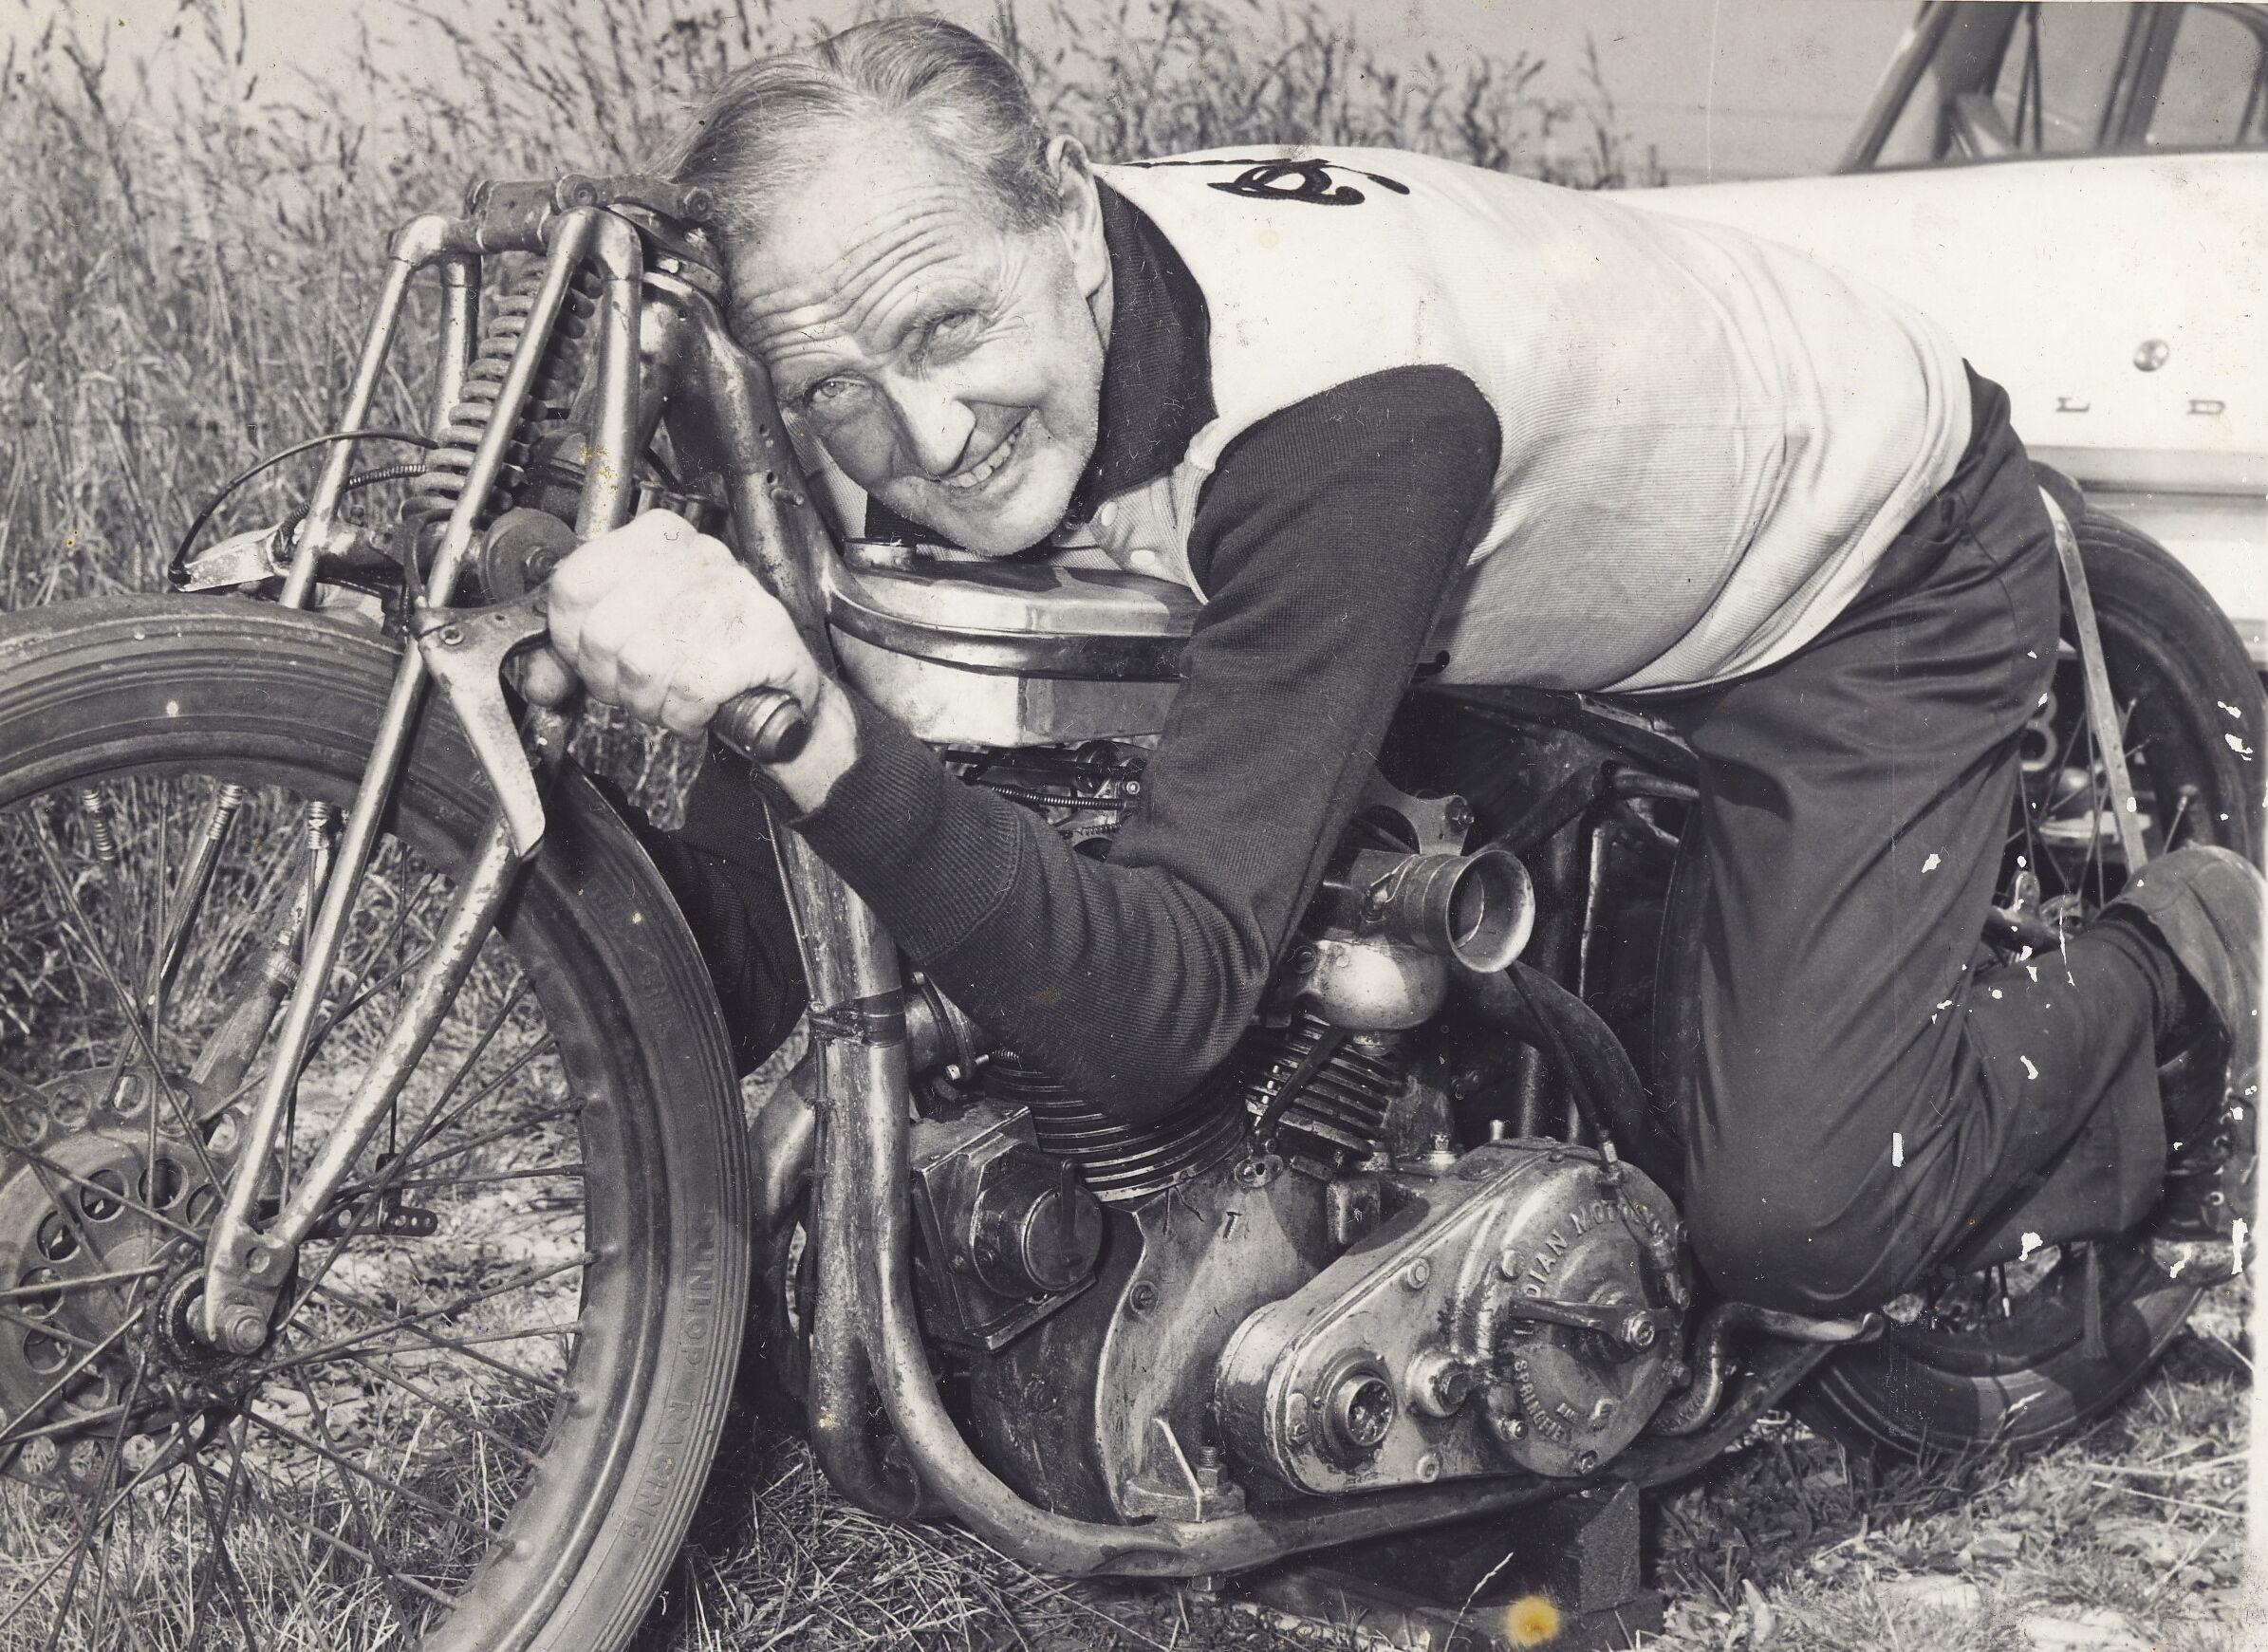 Burt Munro na swoim motocyklu